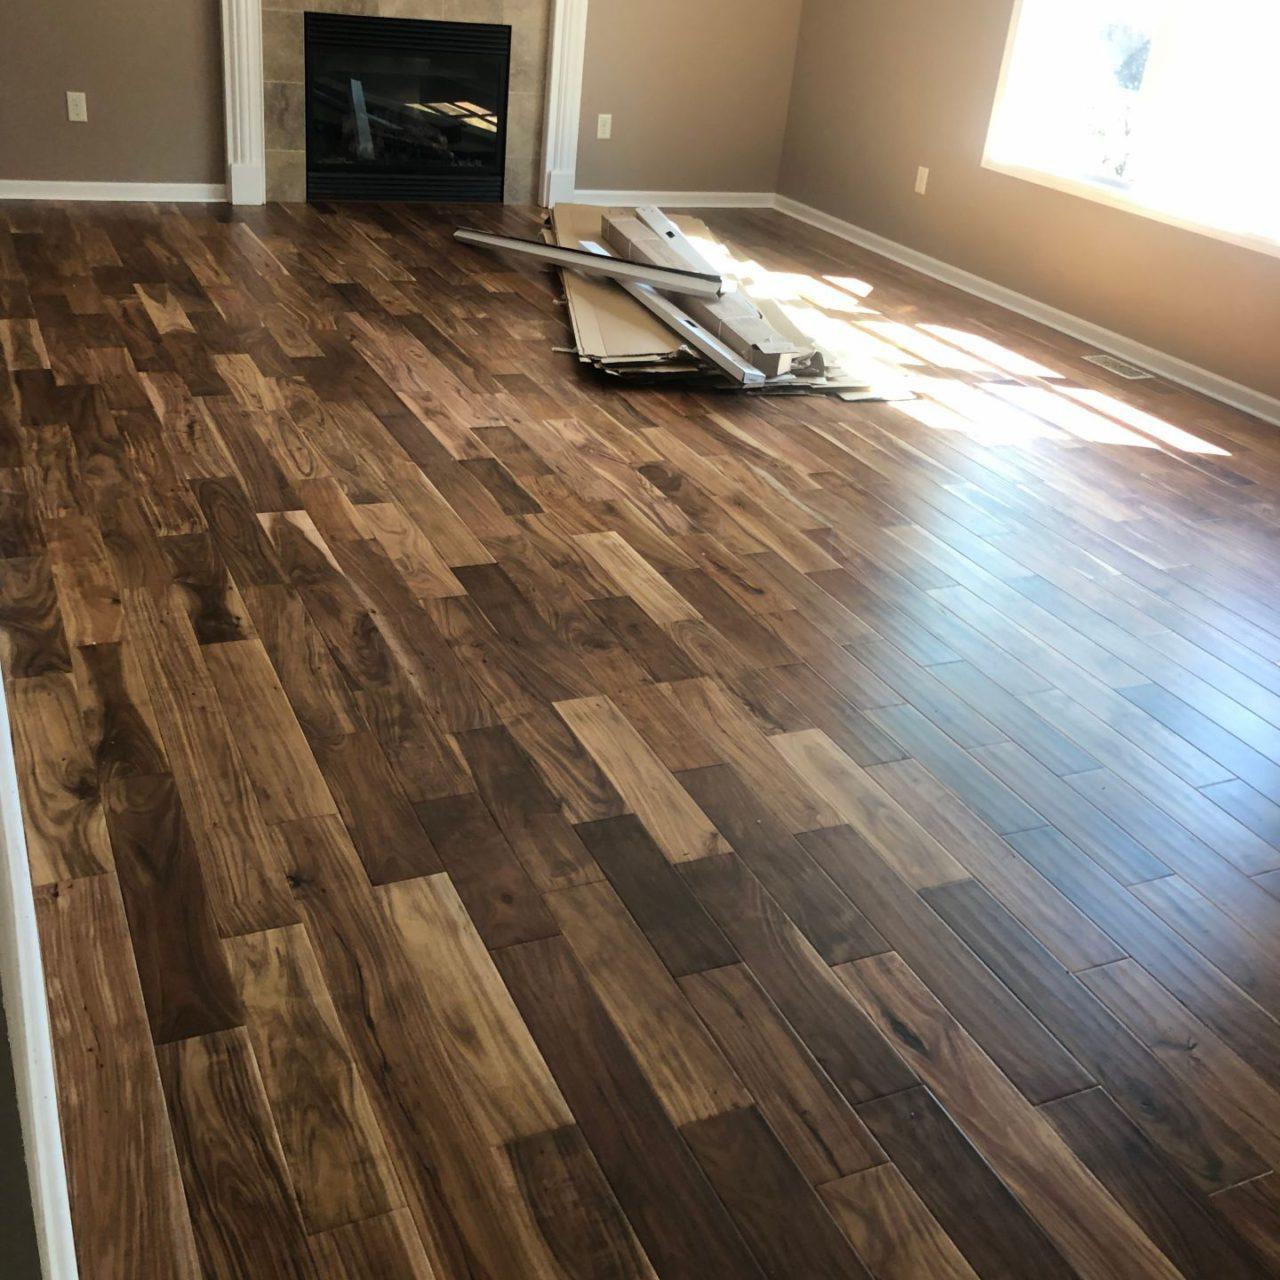 https://buffalosbestflooring.com/wp-content/uploads/2020/06/buffalos-best-engineered-hardwood-flooring-07-1280x1280.jpg